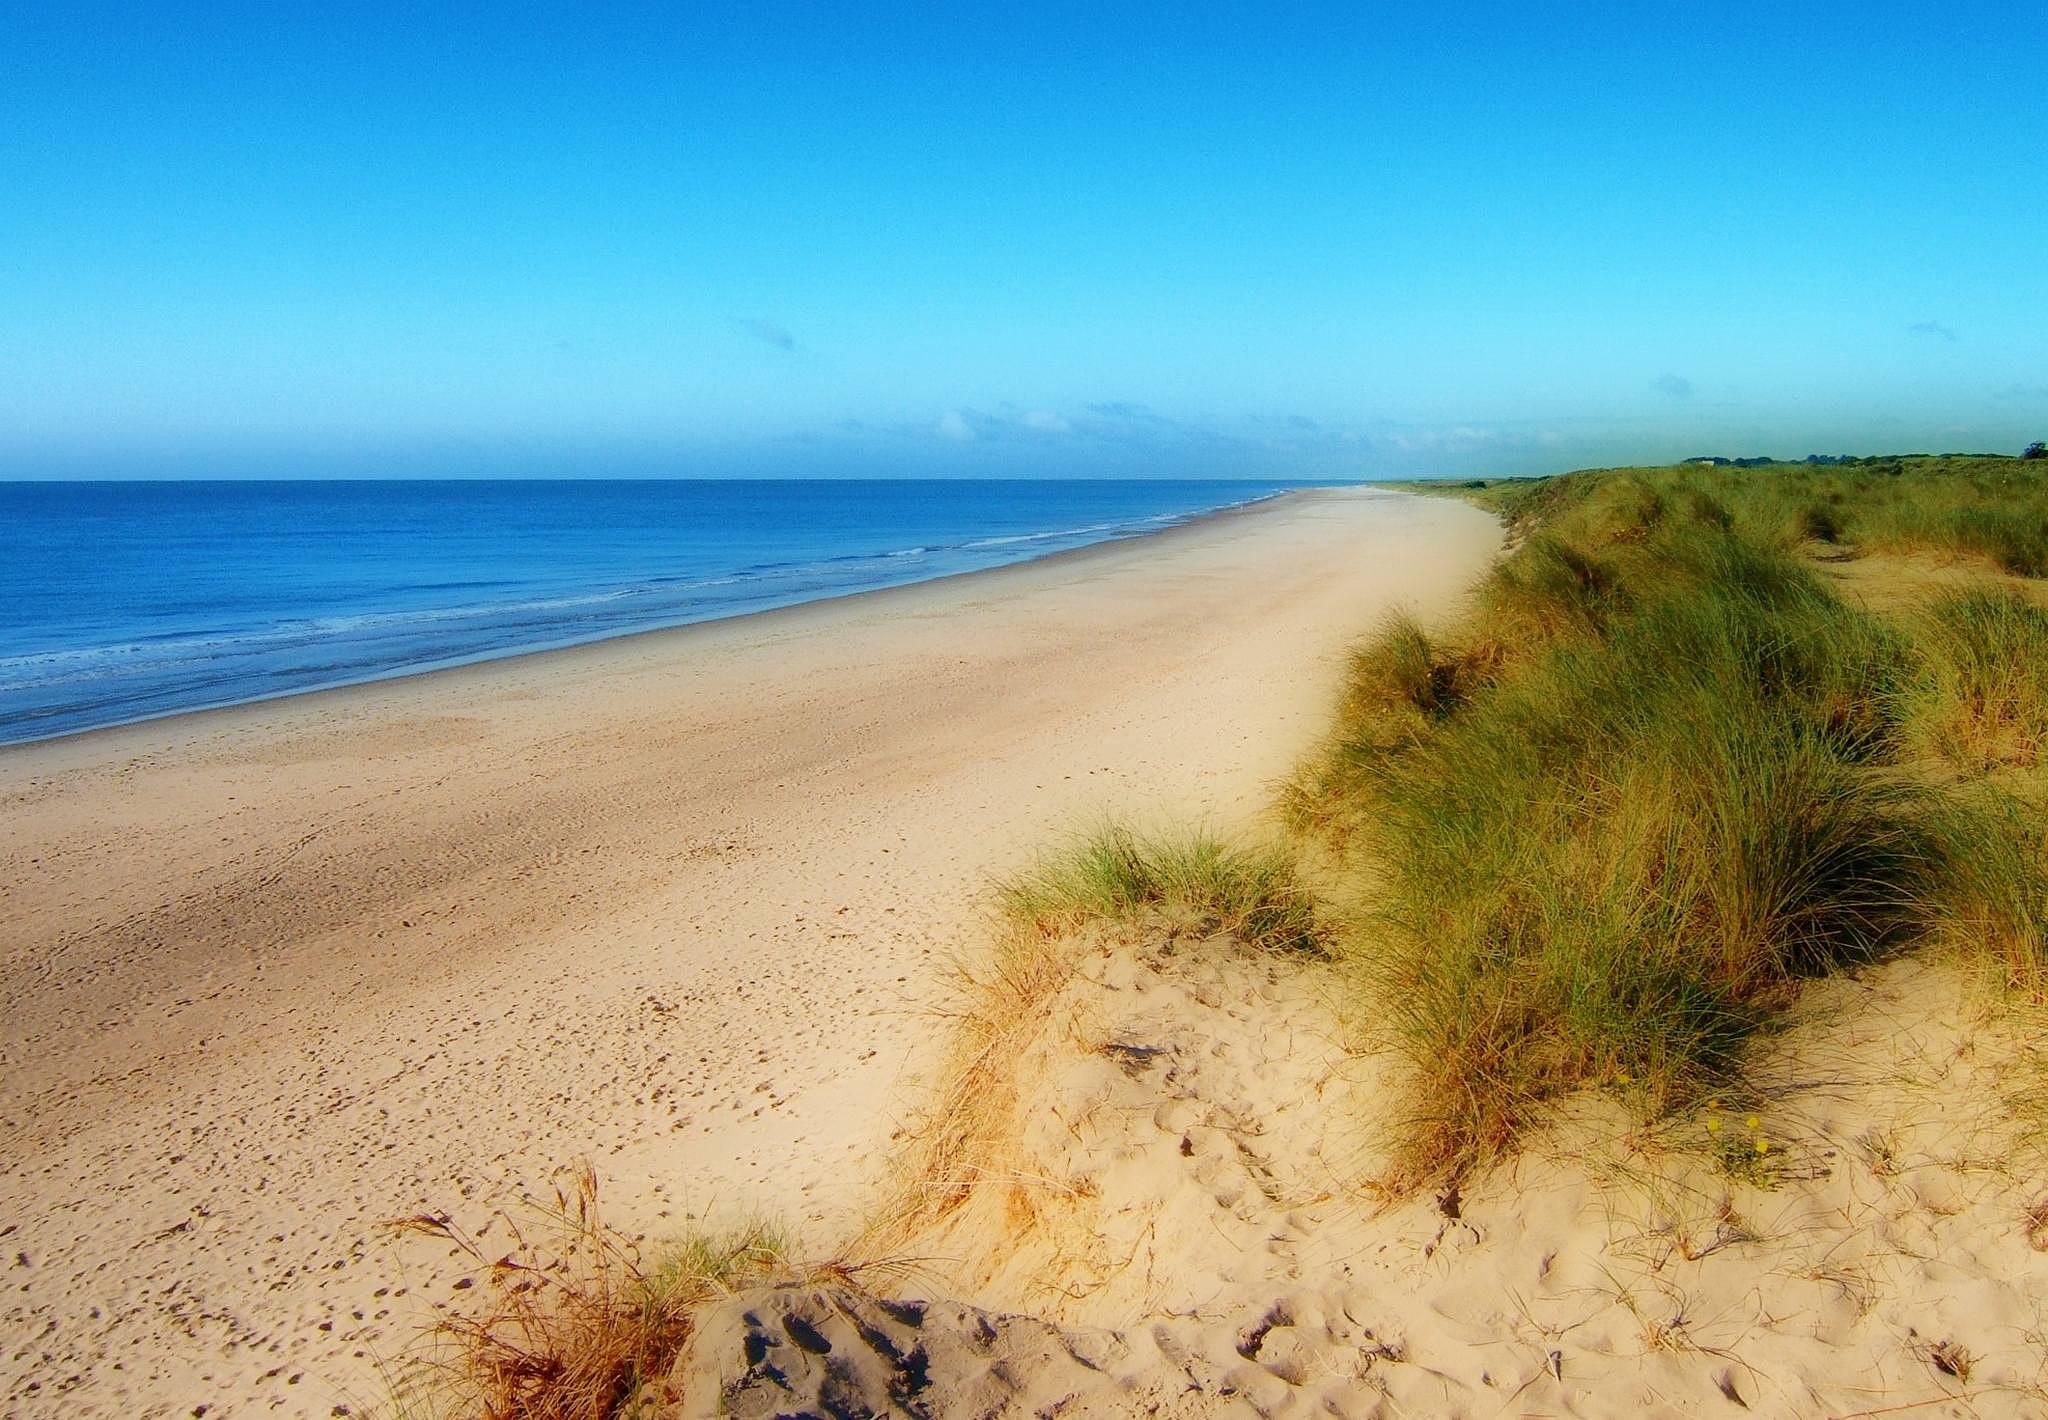 quality beach by Vitalijus Ruth